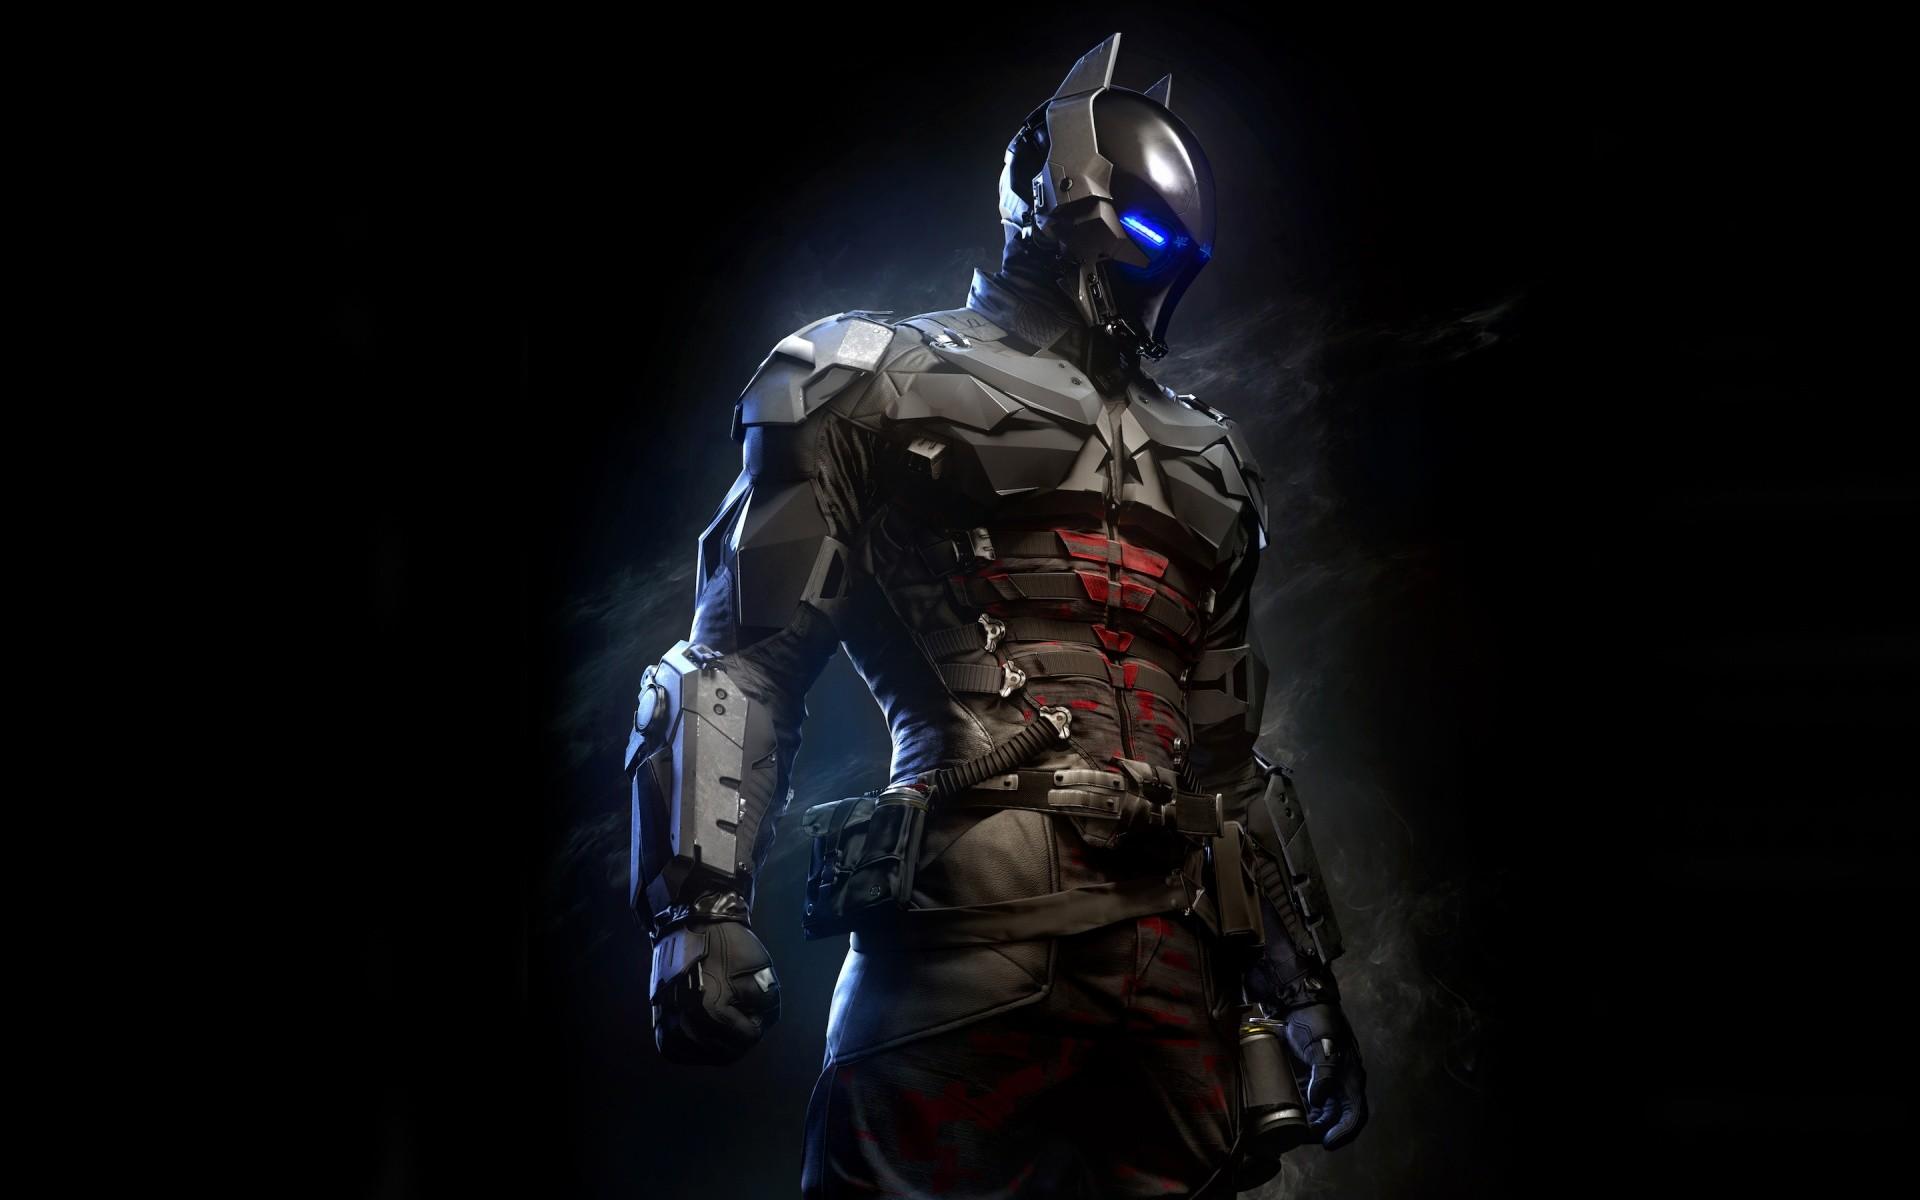 Batman Arkham Knight <b>Game Wallpapers</b> in jpg format for